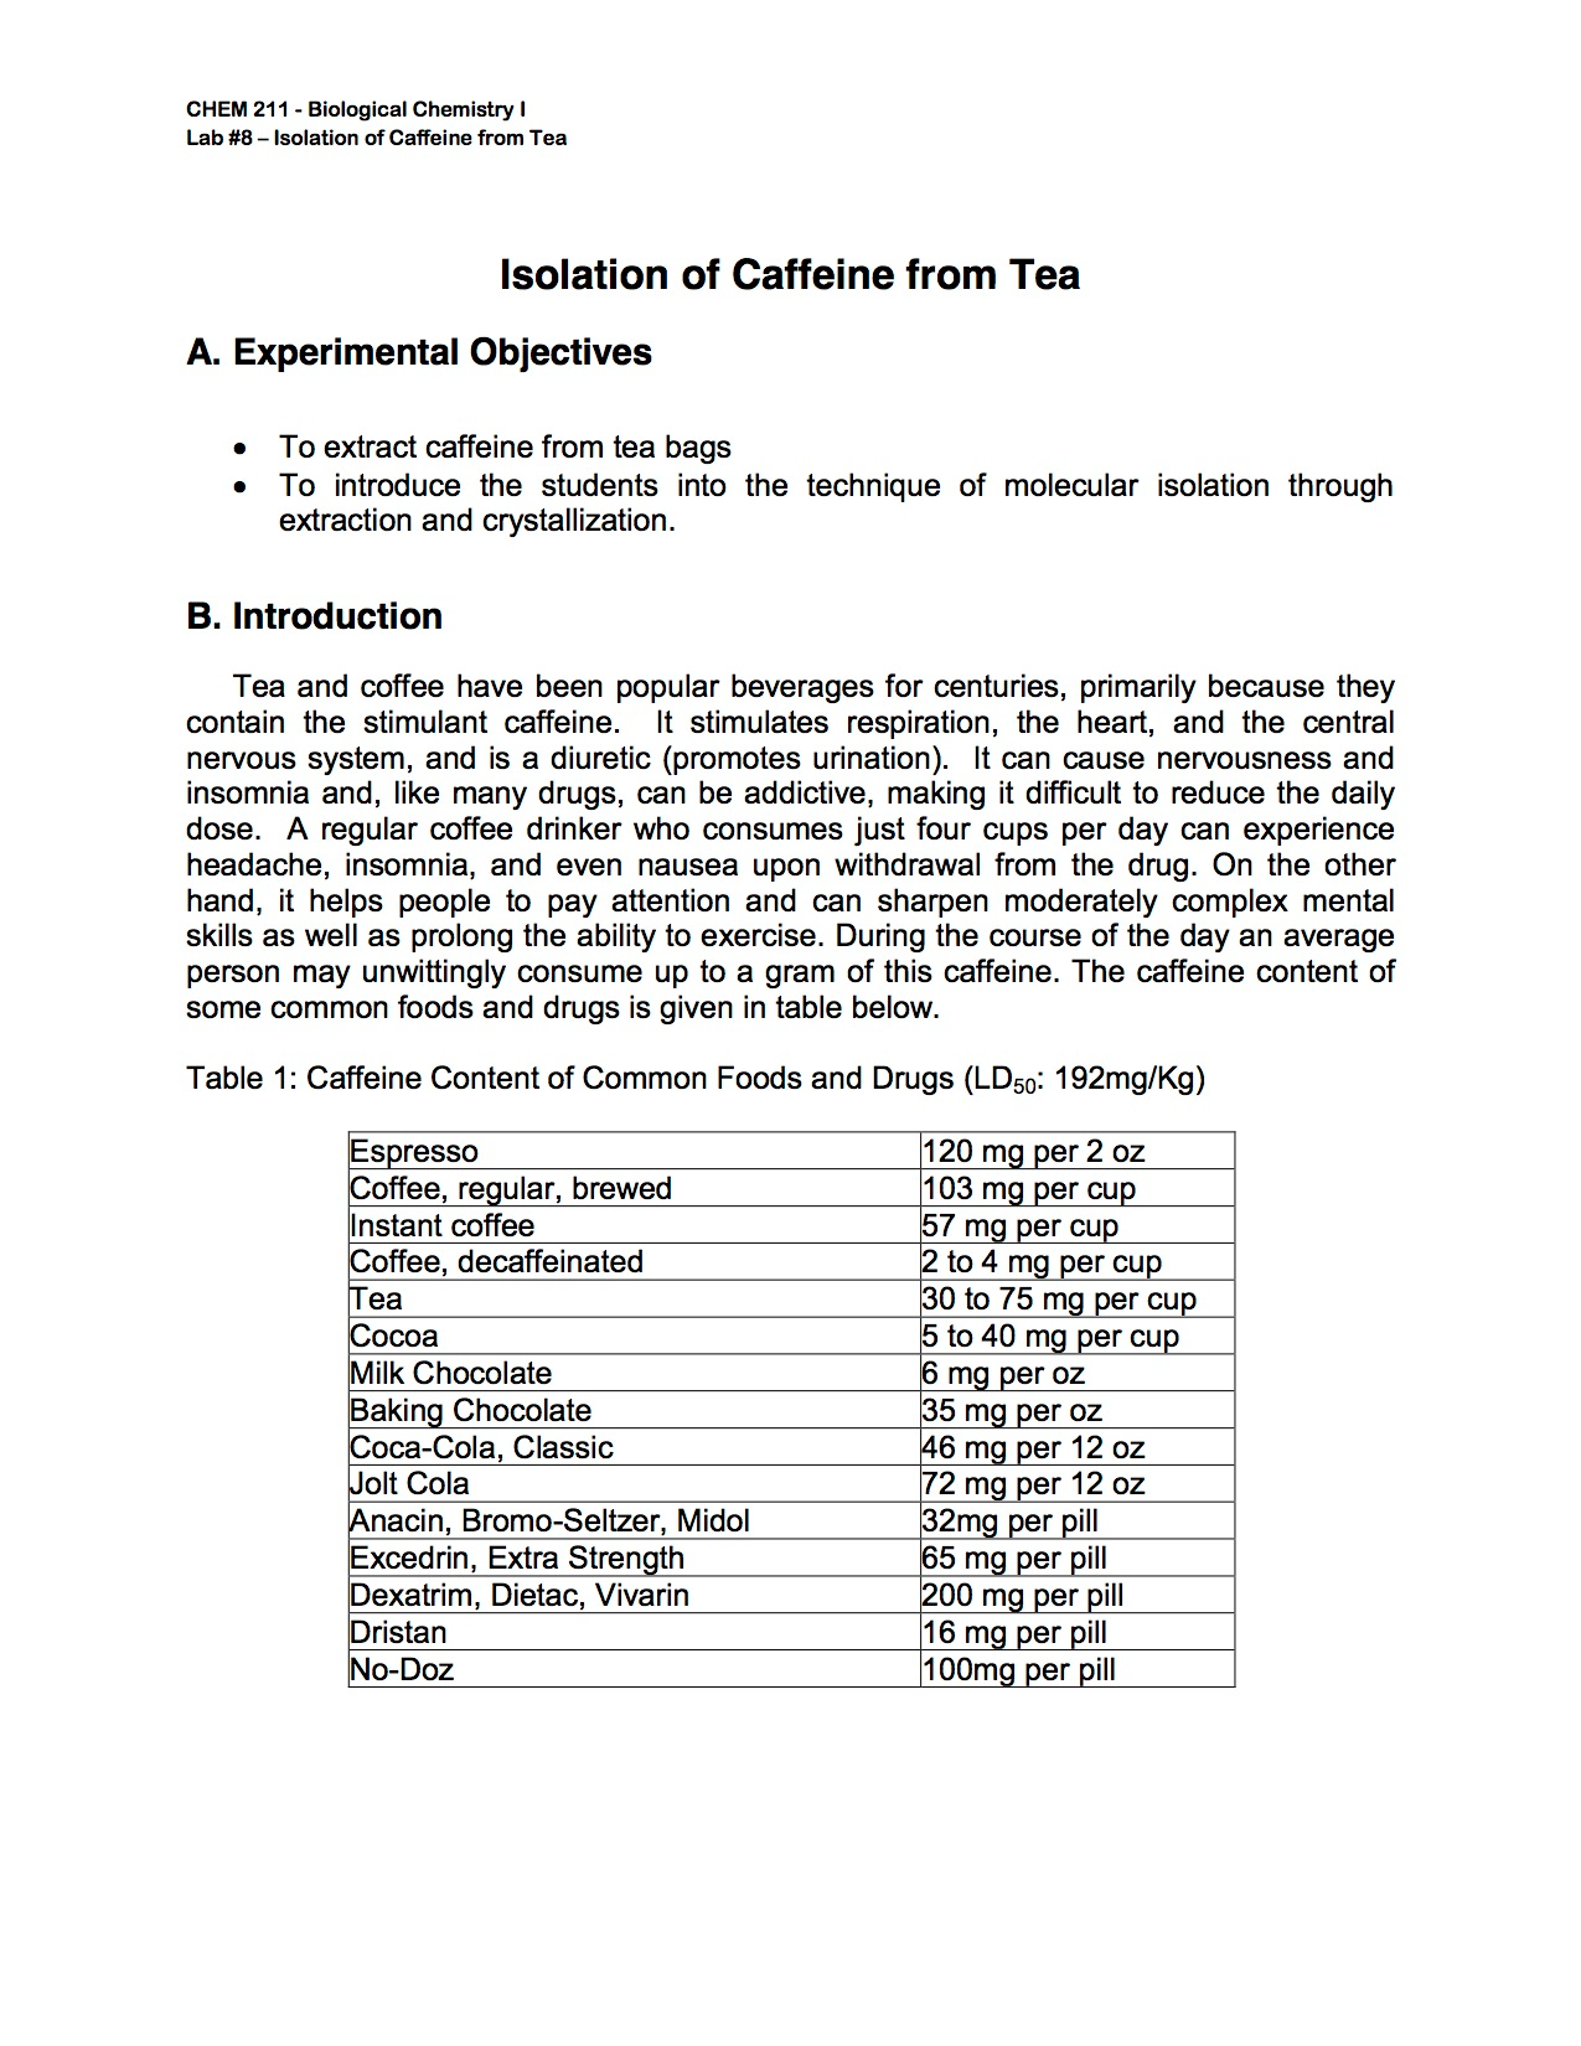 CHEM 211 - Biological Chemistry I Lab #8-Isolation of Caffeine from Tea  lsolation